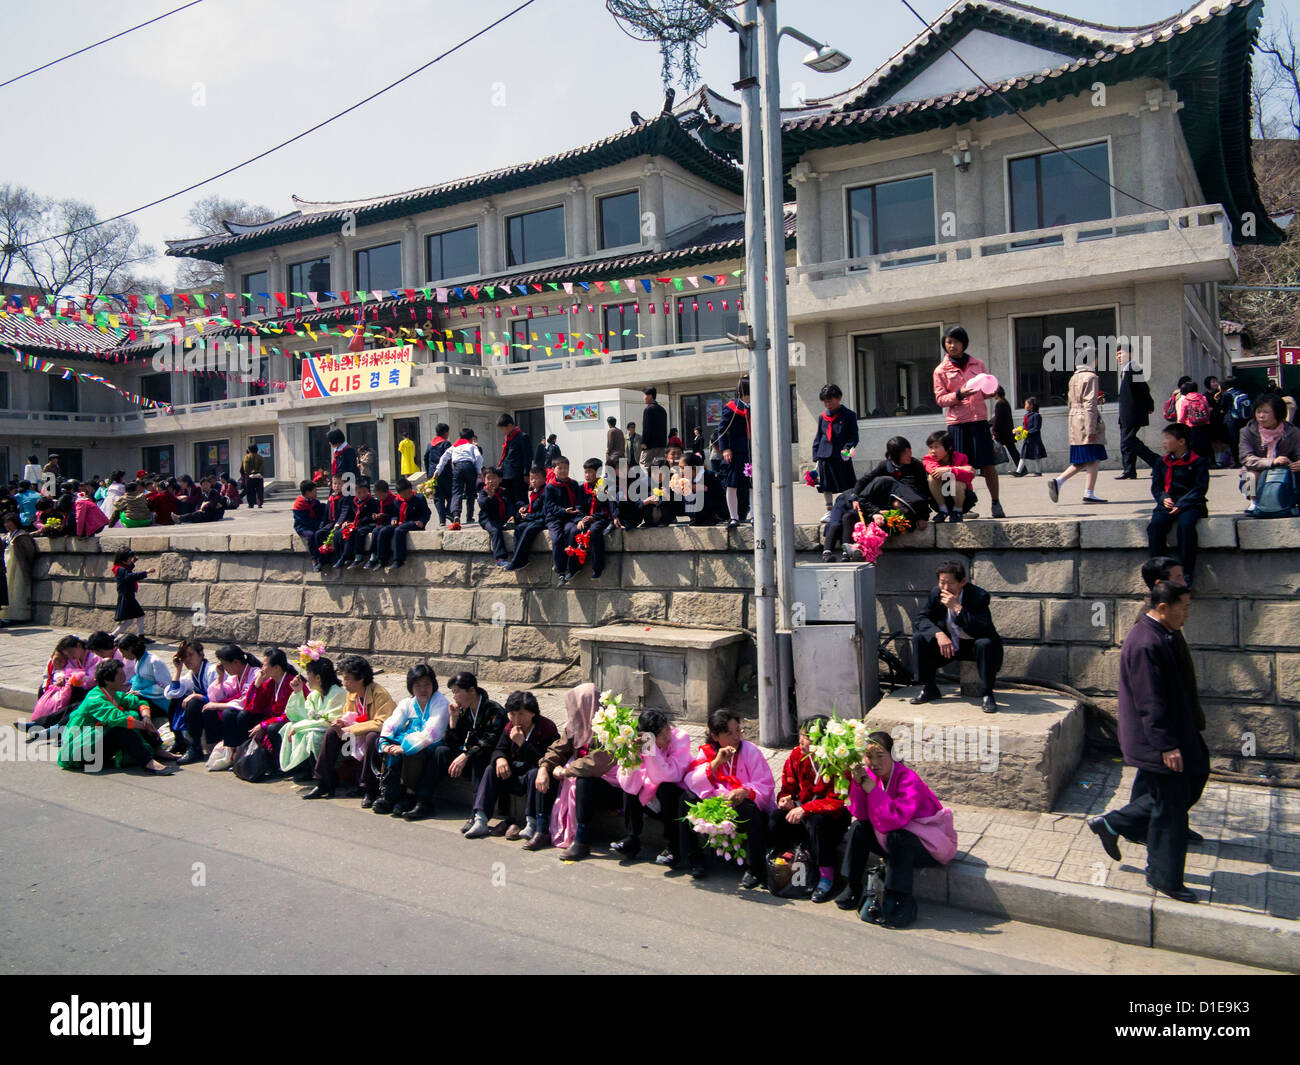 Typical urban street scene, Pyongyang, Democratic People's Republic of Korea (DPRK), North Korea, Asia - Stock Image